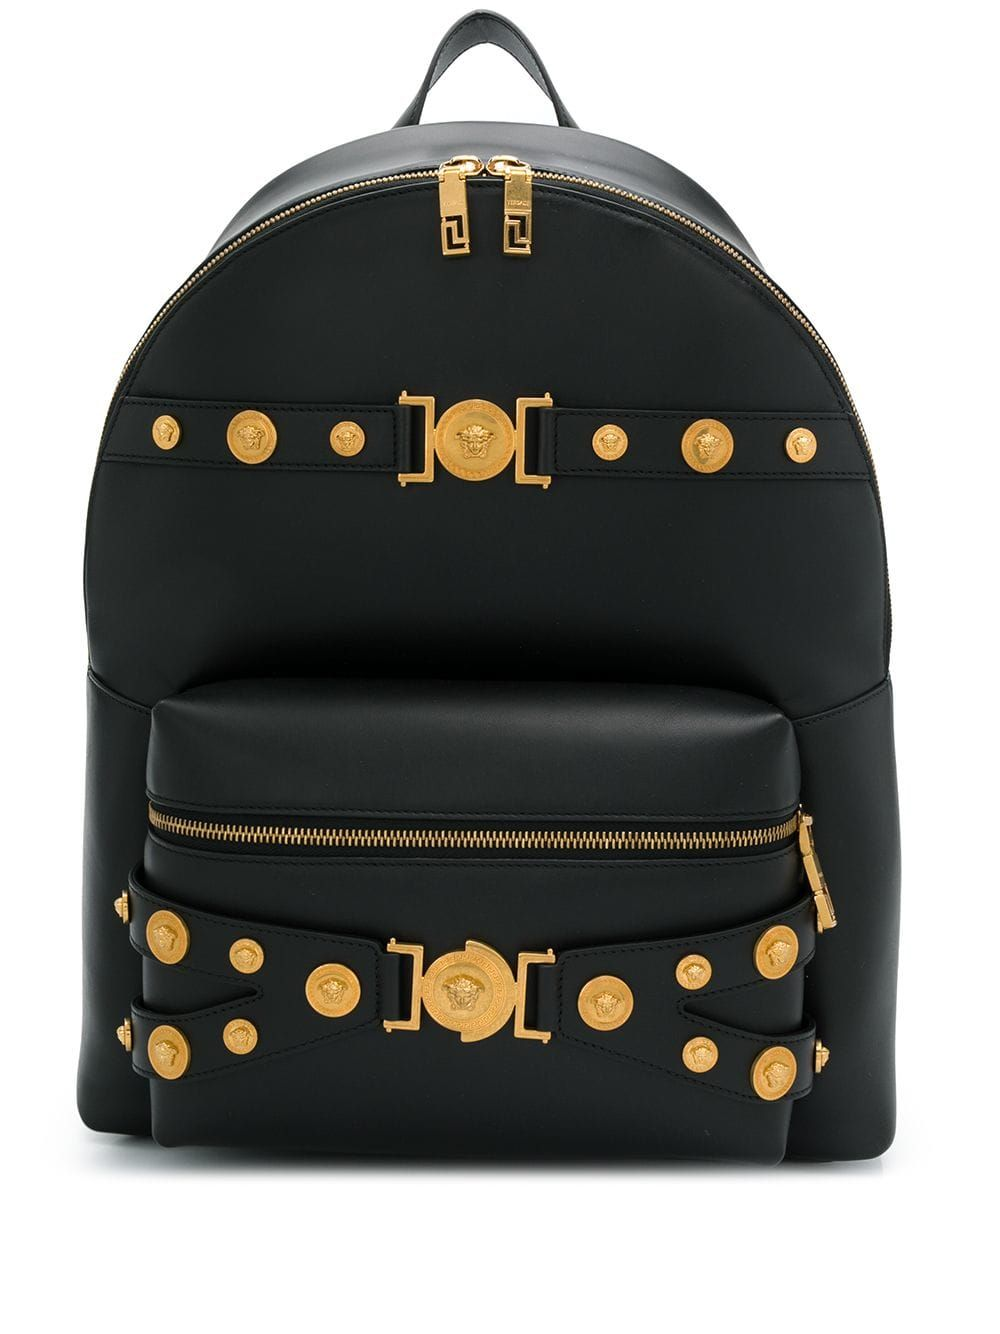 Tribute leather backpack in black stylish handbag